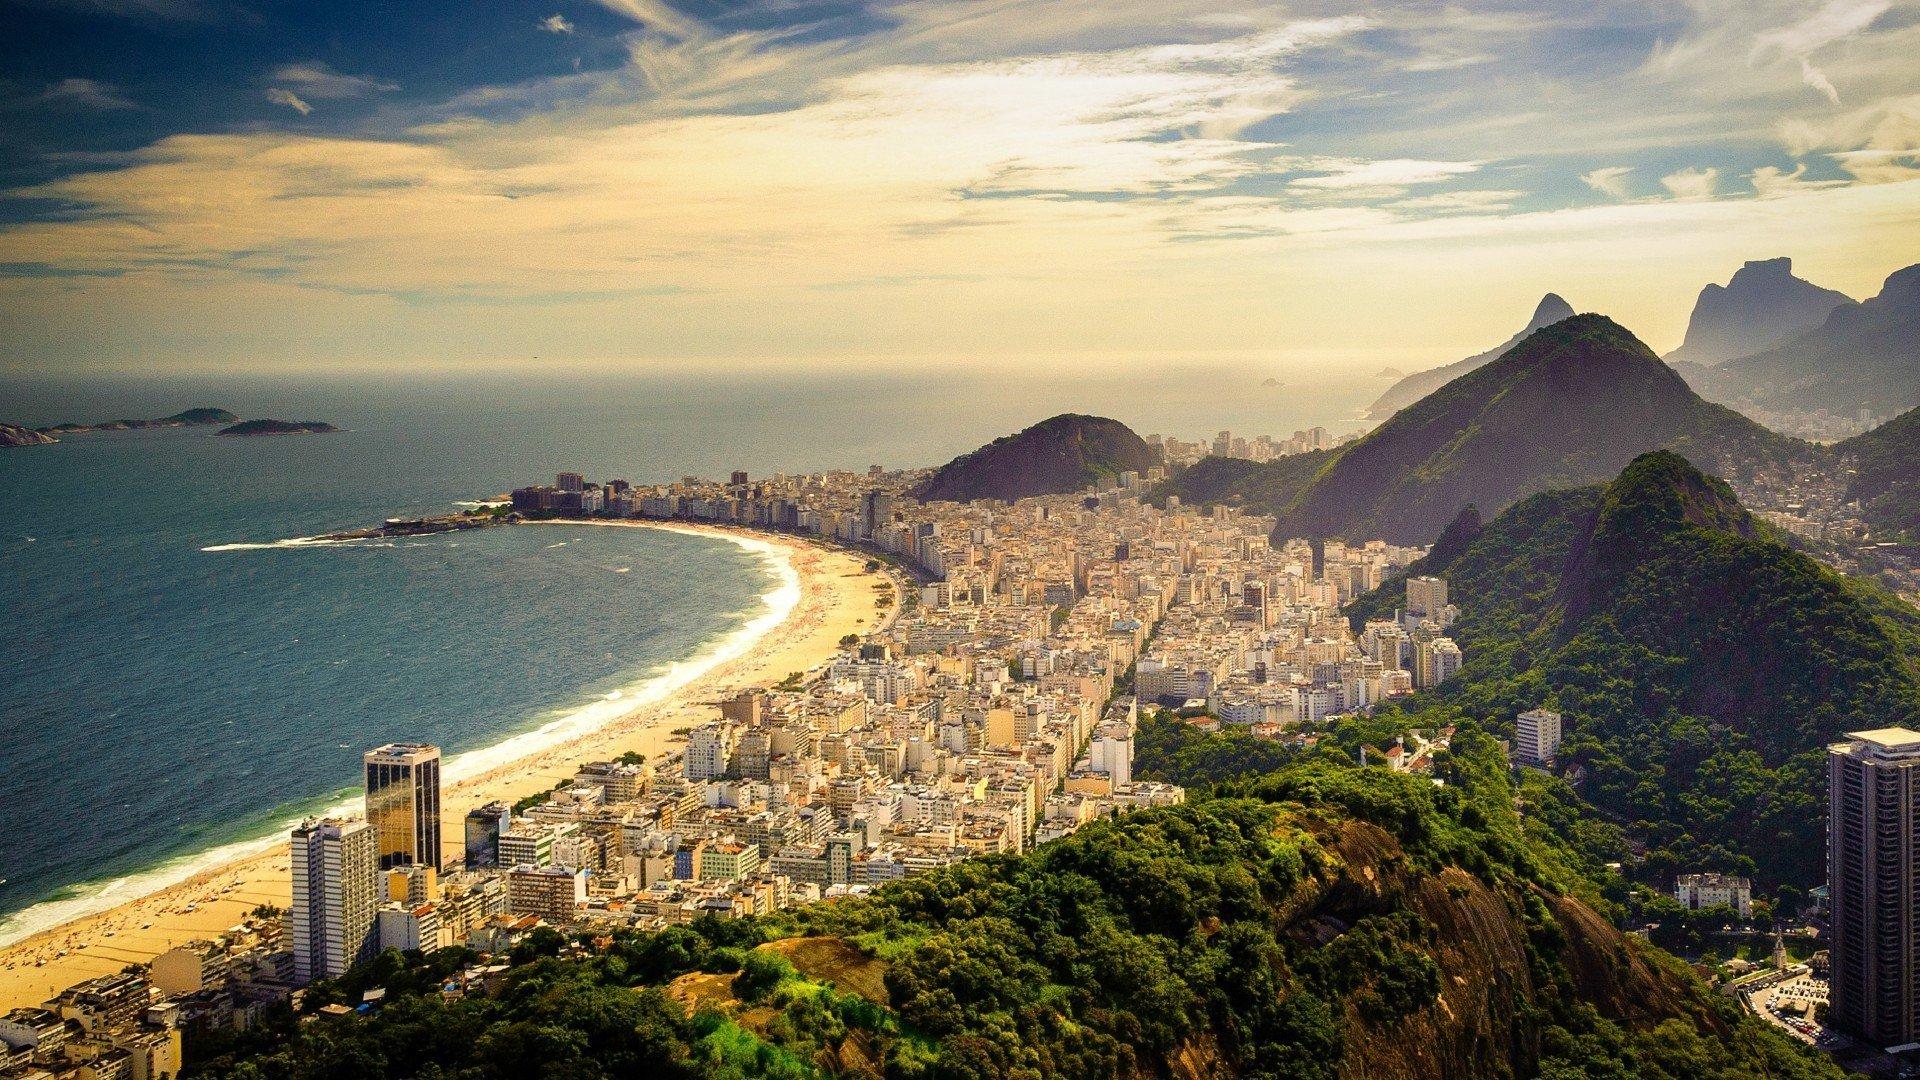 copacabana-beach-brazil_729